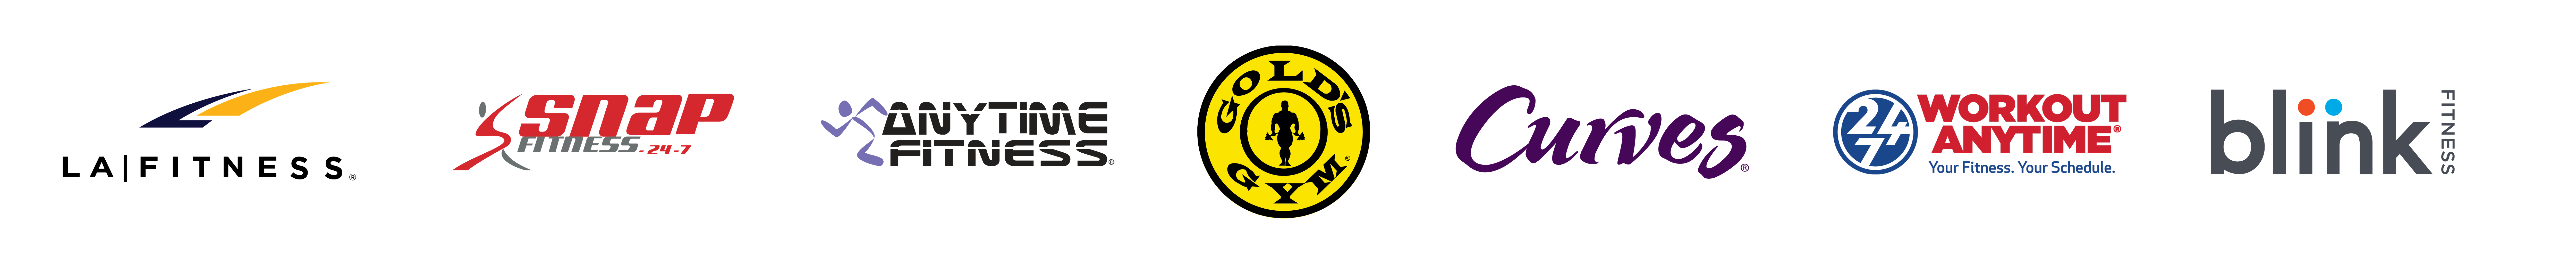 Fitness Logos-1